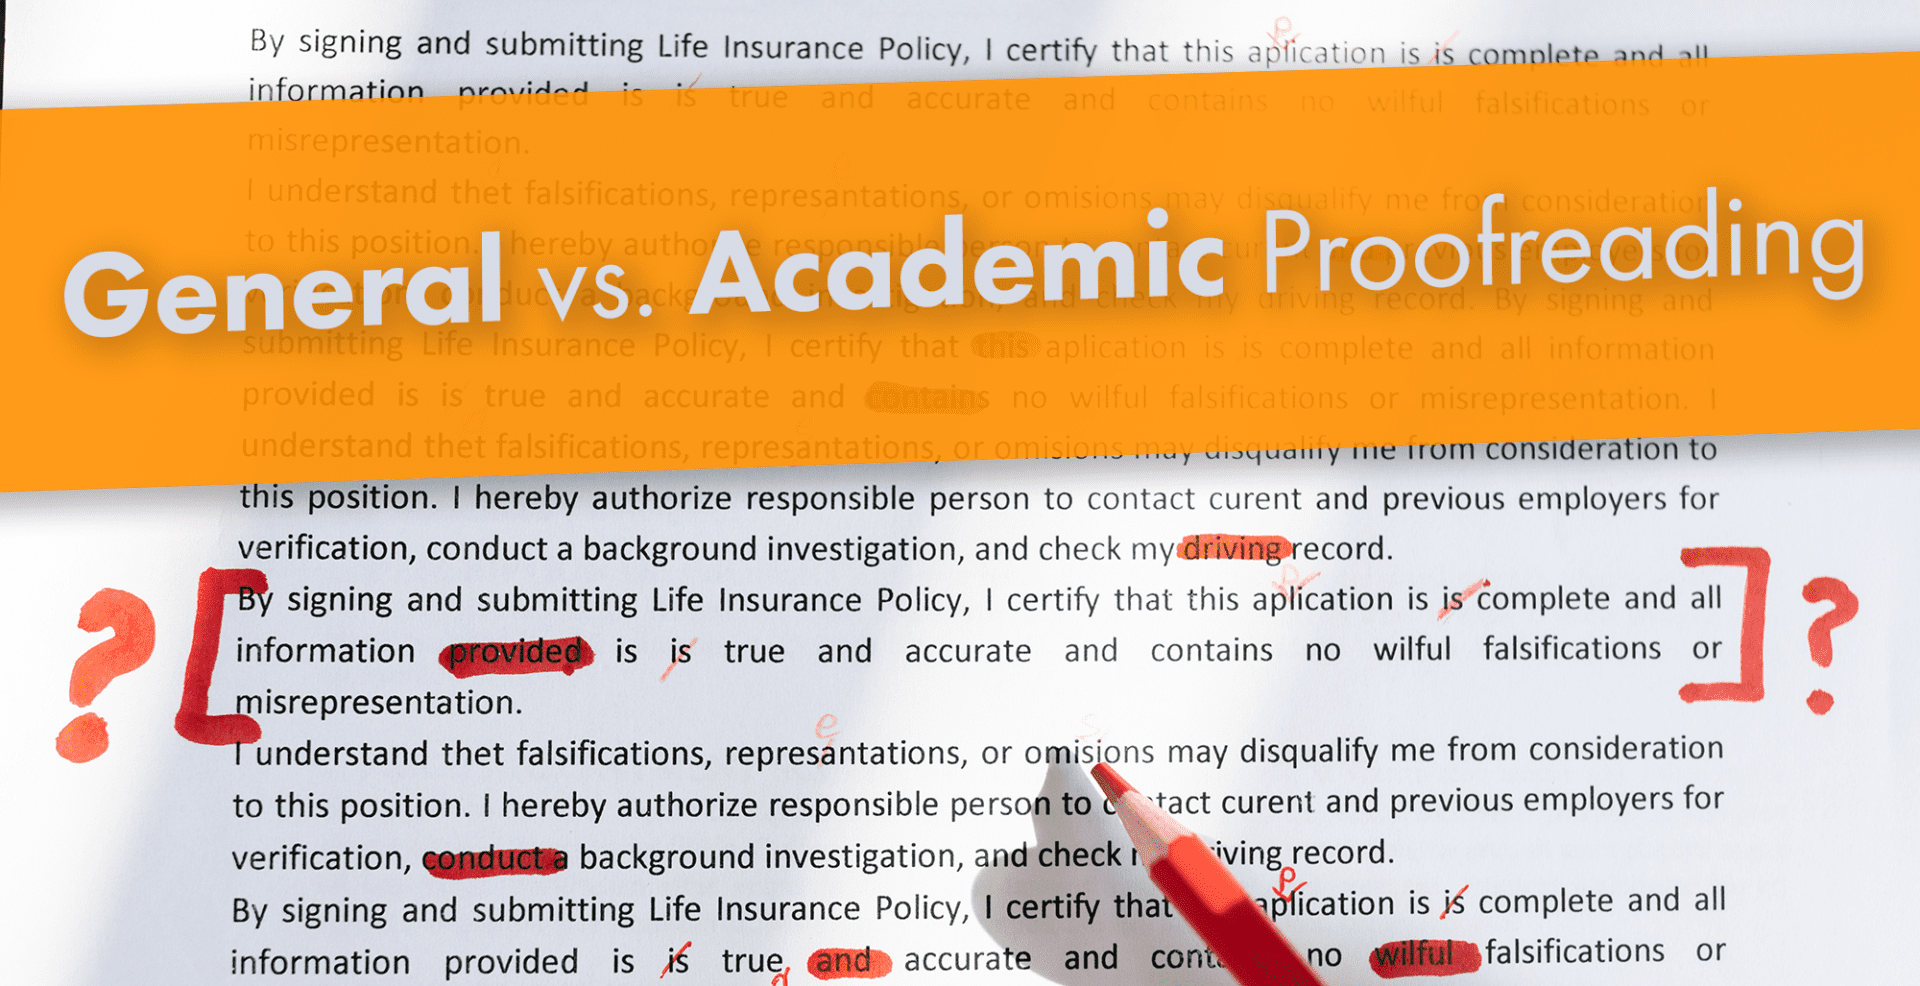 General vs. Academic Proofreading